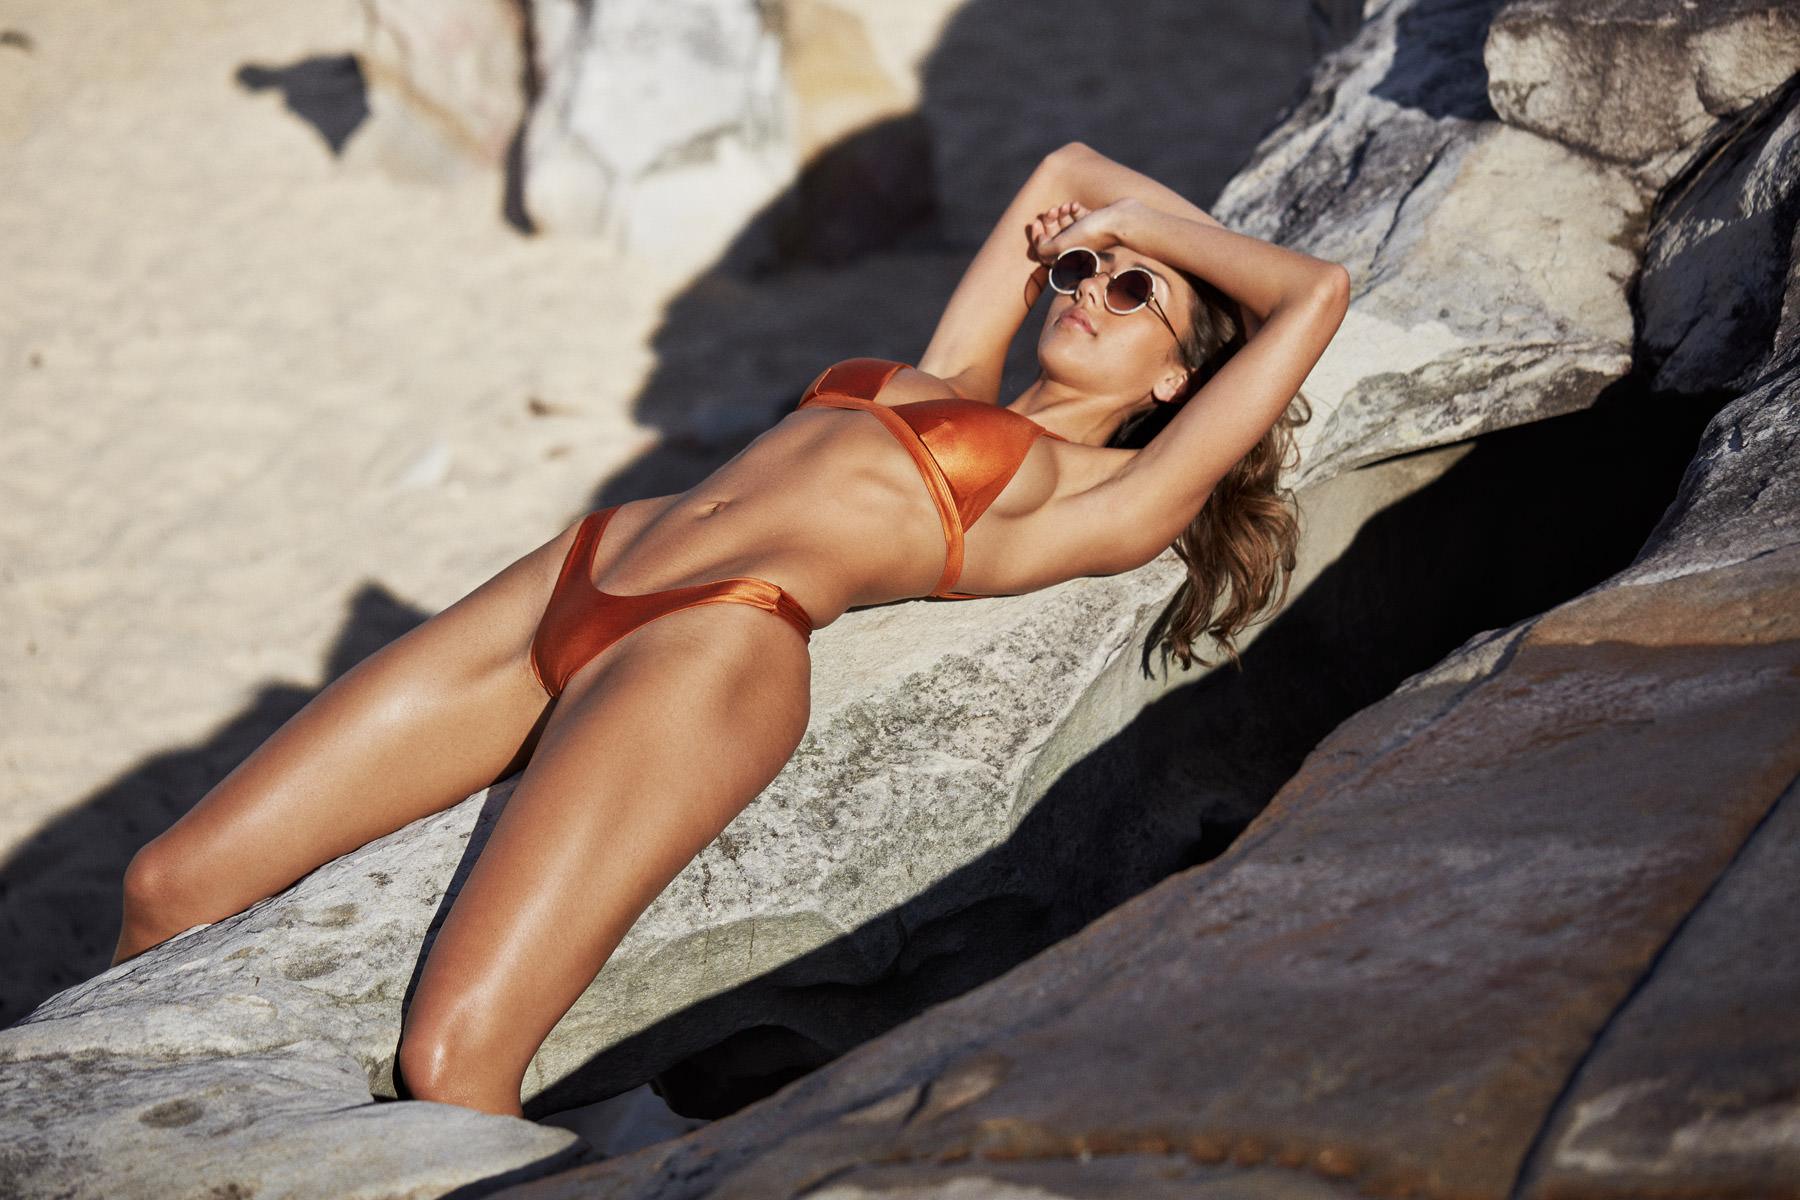 I AM ZAZIE Swimwear Campaign - The Harper Luxe Triangle Bikini Top & Yvie Luxe Cheeky Bikini Pant in 'Whiskey' Italian Lycra.  SHOP THE LOOK HERE →